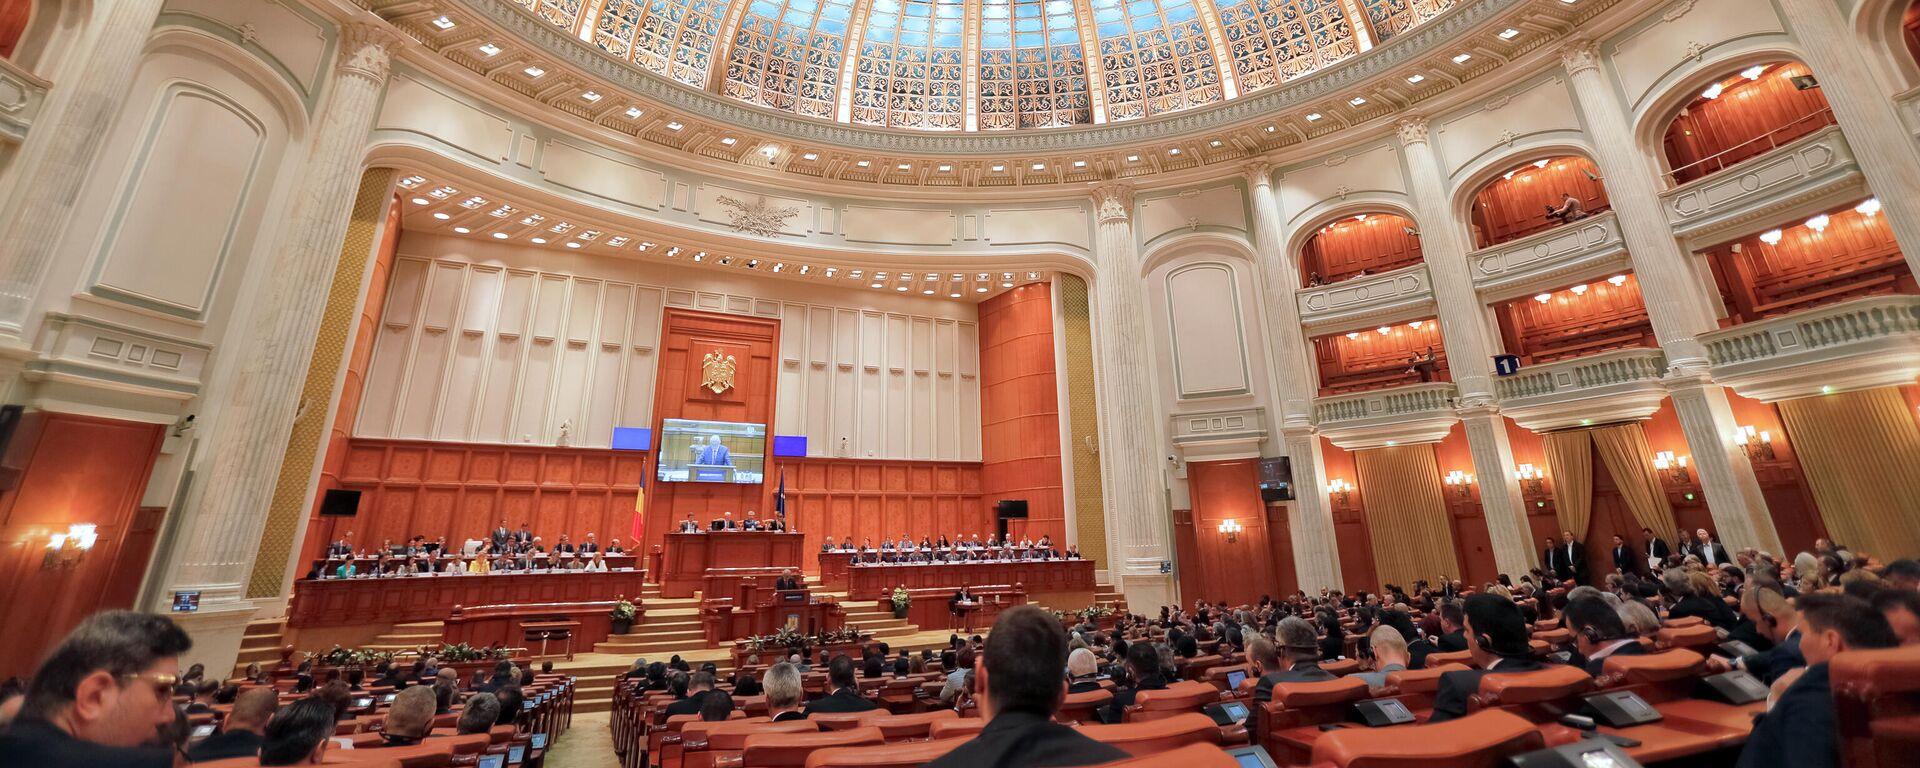 Rumänische Parlamentarier (Archivbild) - SNA, 1920, 21.12.2020